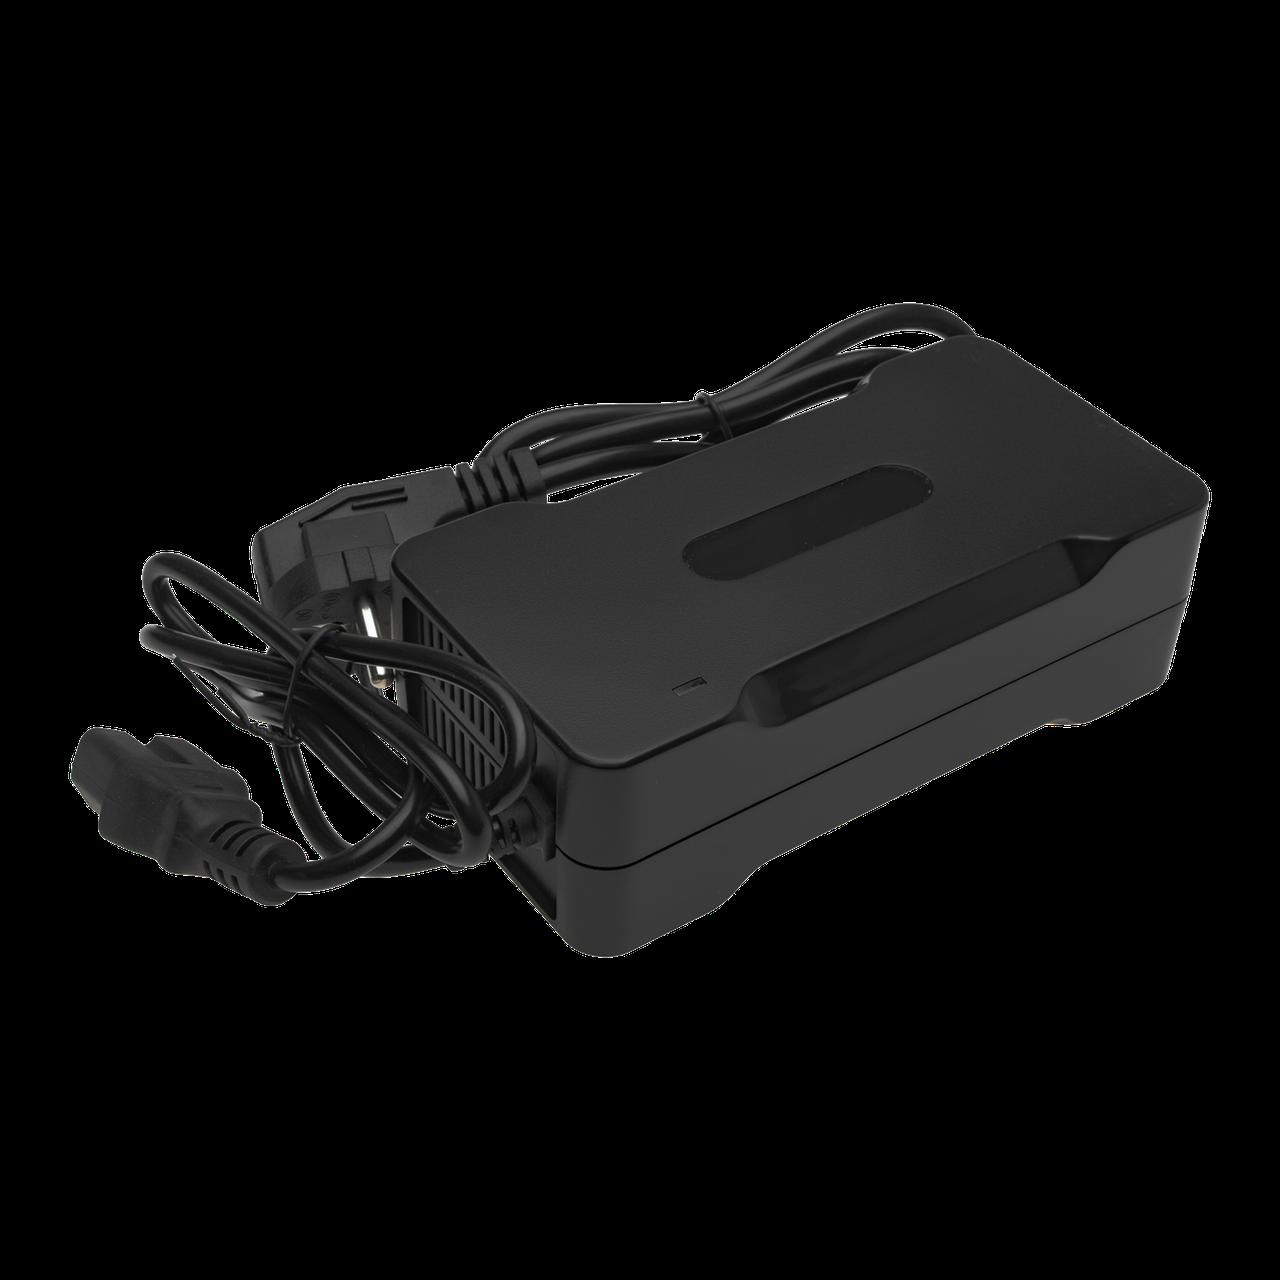 Зарядное устройство для аккумуляторов LiFePO4 60V (73V)-2A-120W